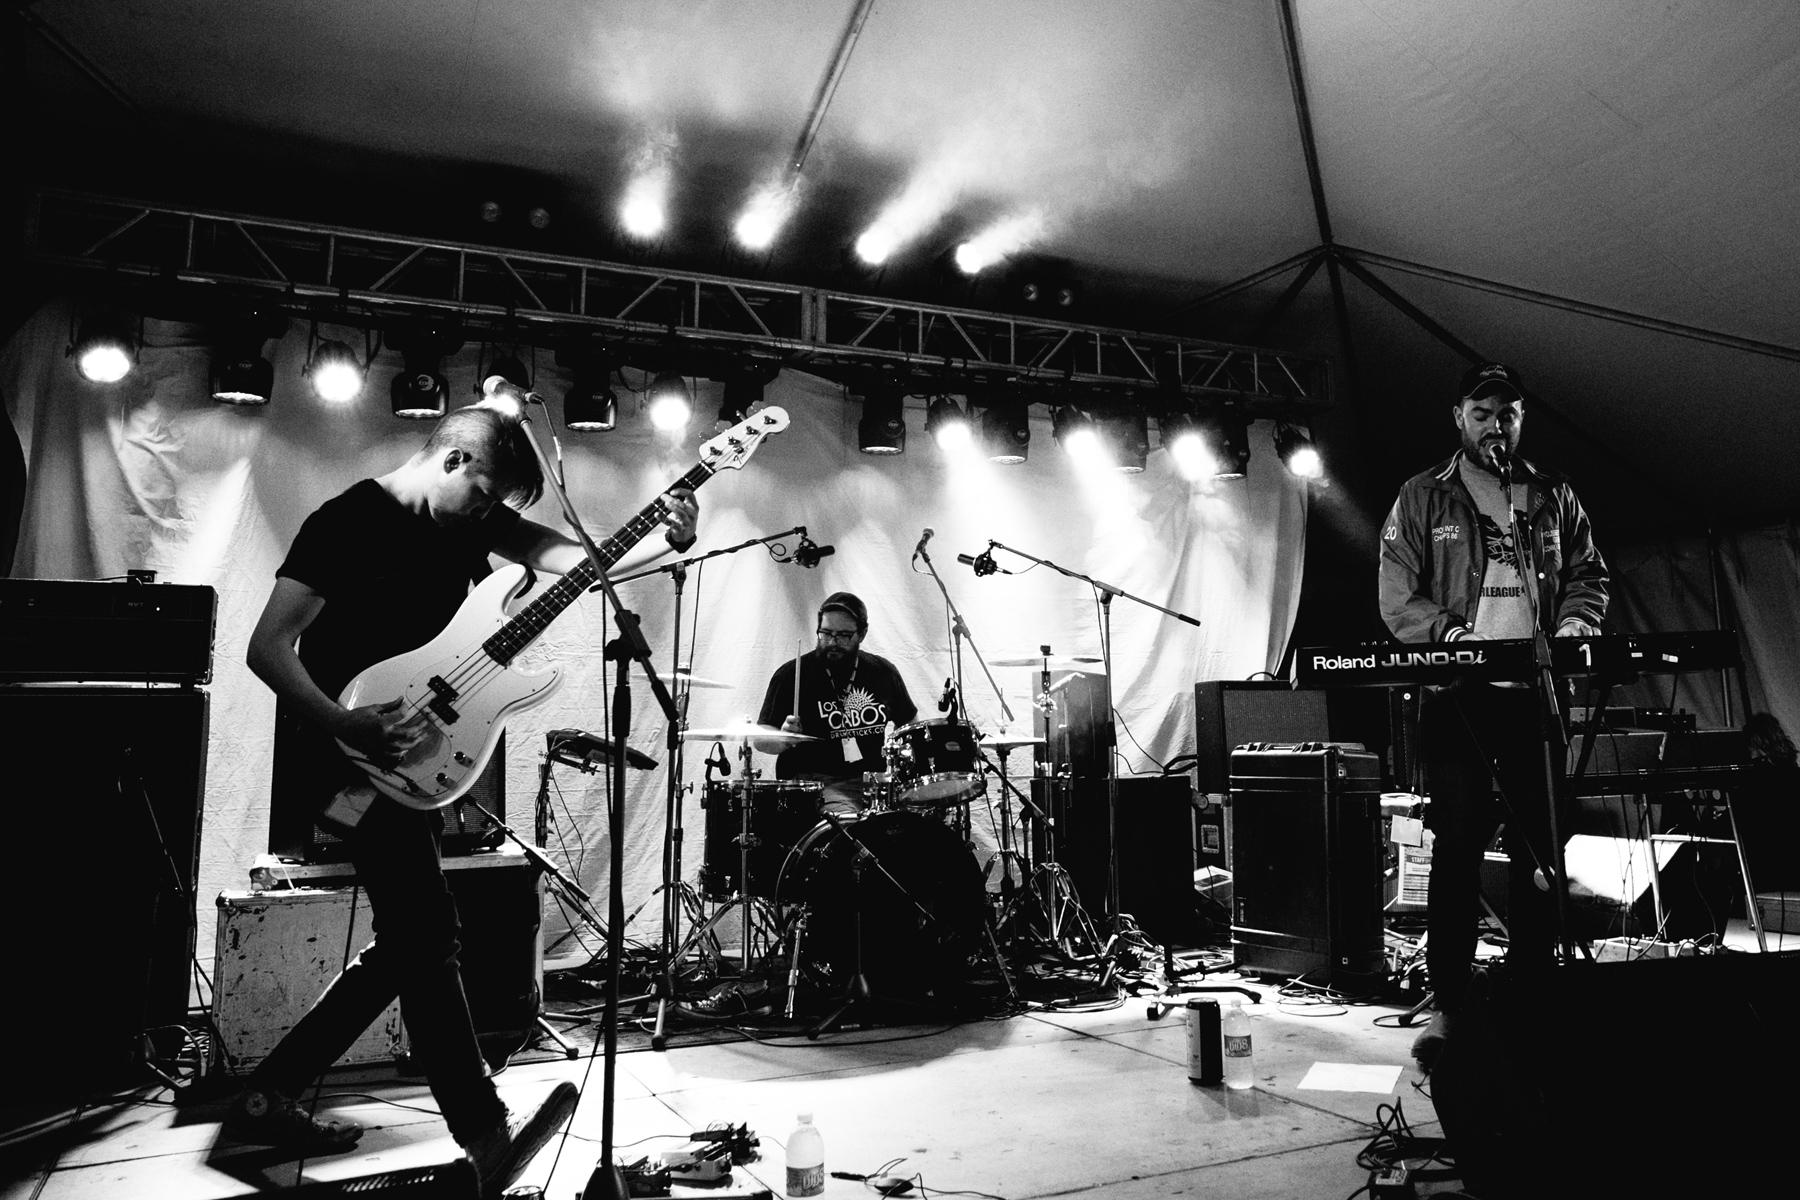 023-harvest-jazz-blues-festival-2017-kandisebrown